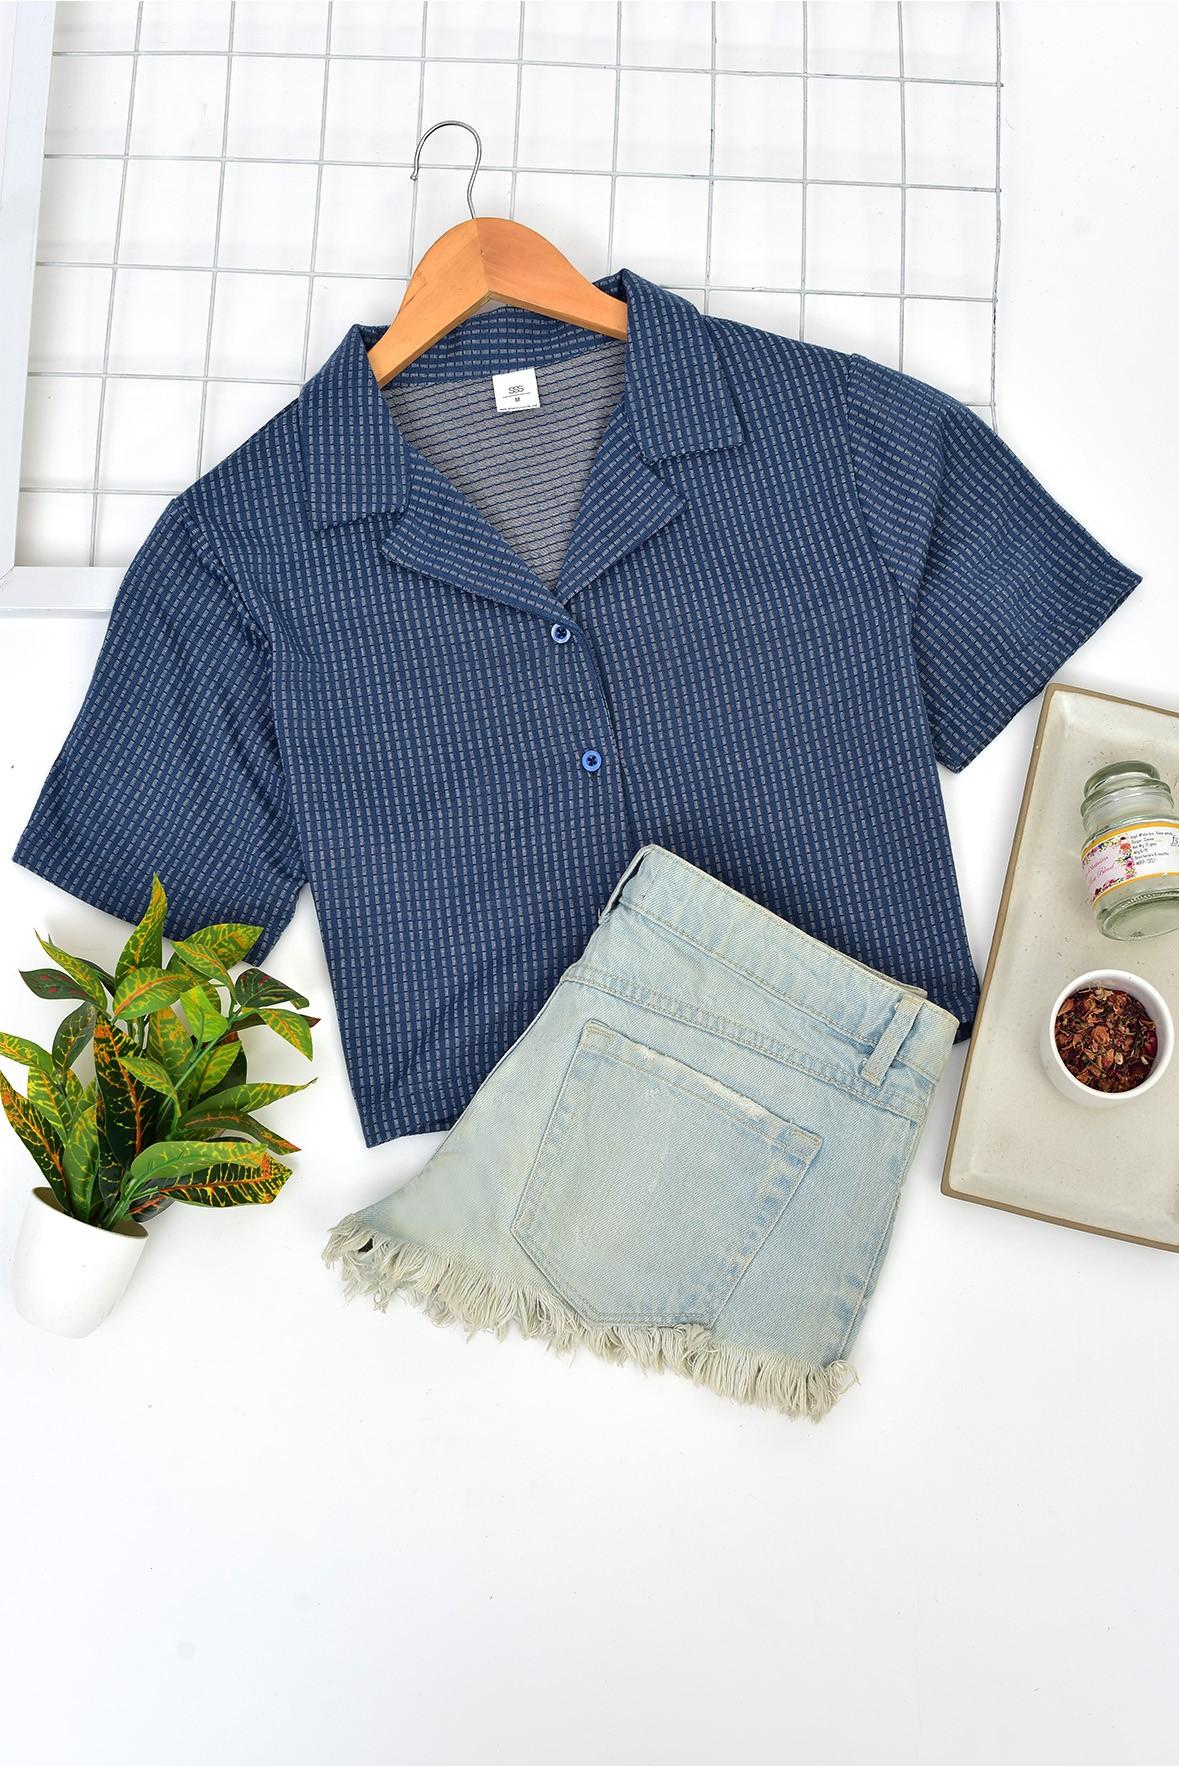 Plaid Shirt Style Crop Top